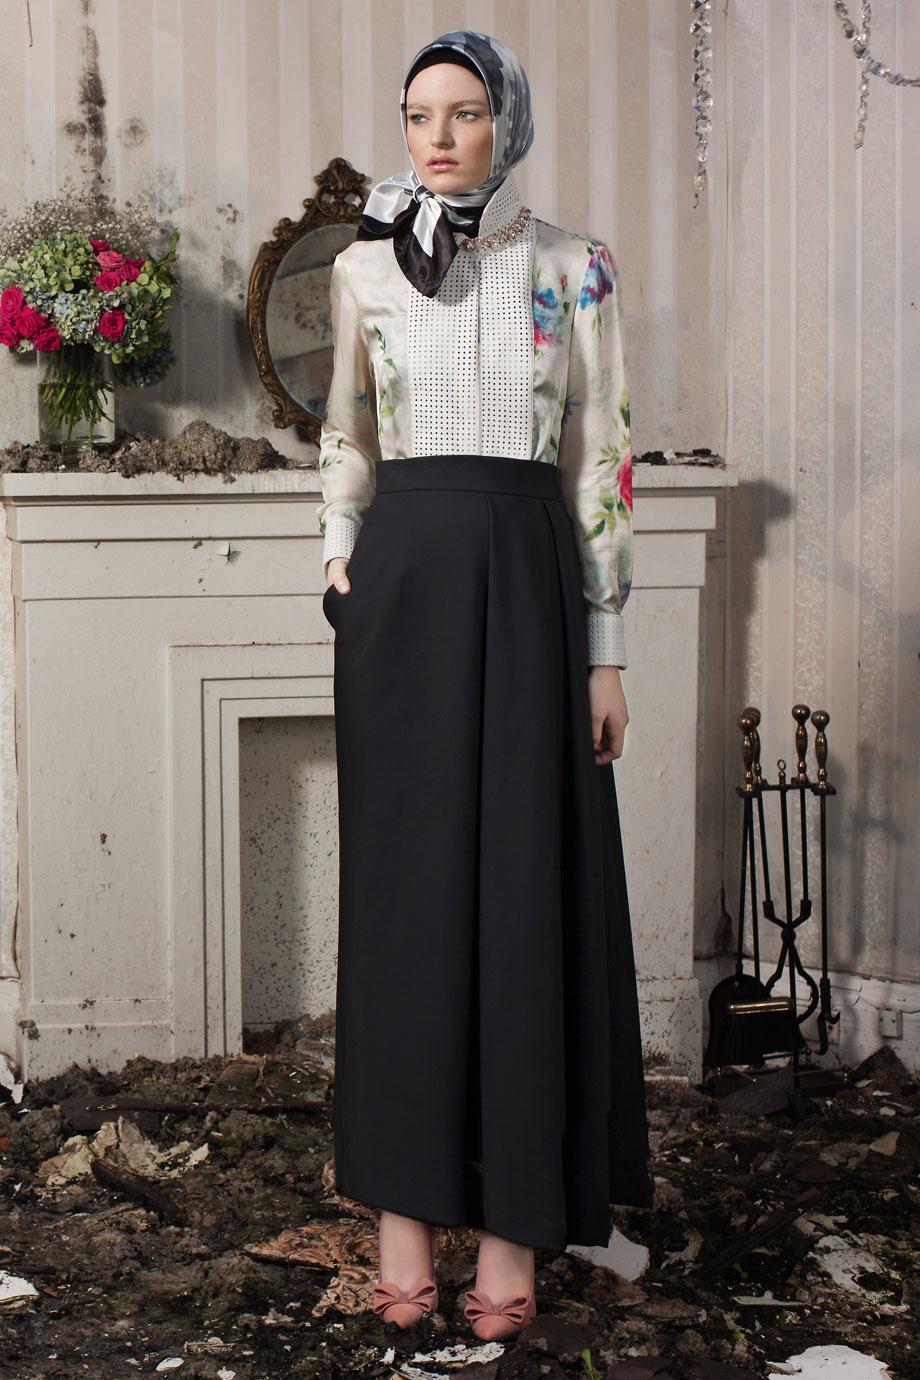 Diana-Kotb-Time-Piece-Skirt-Black-Campaign